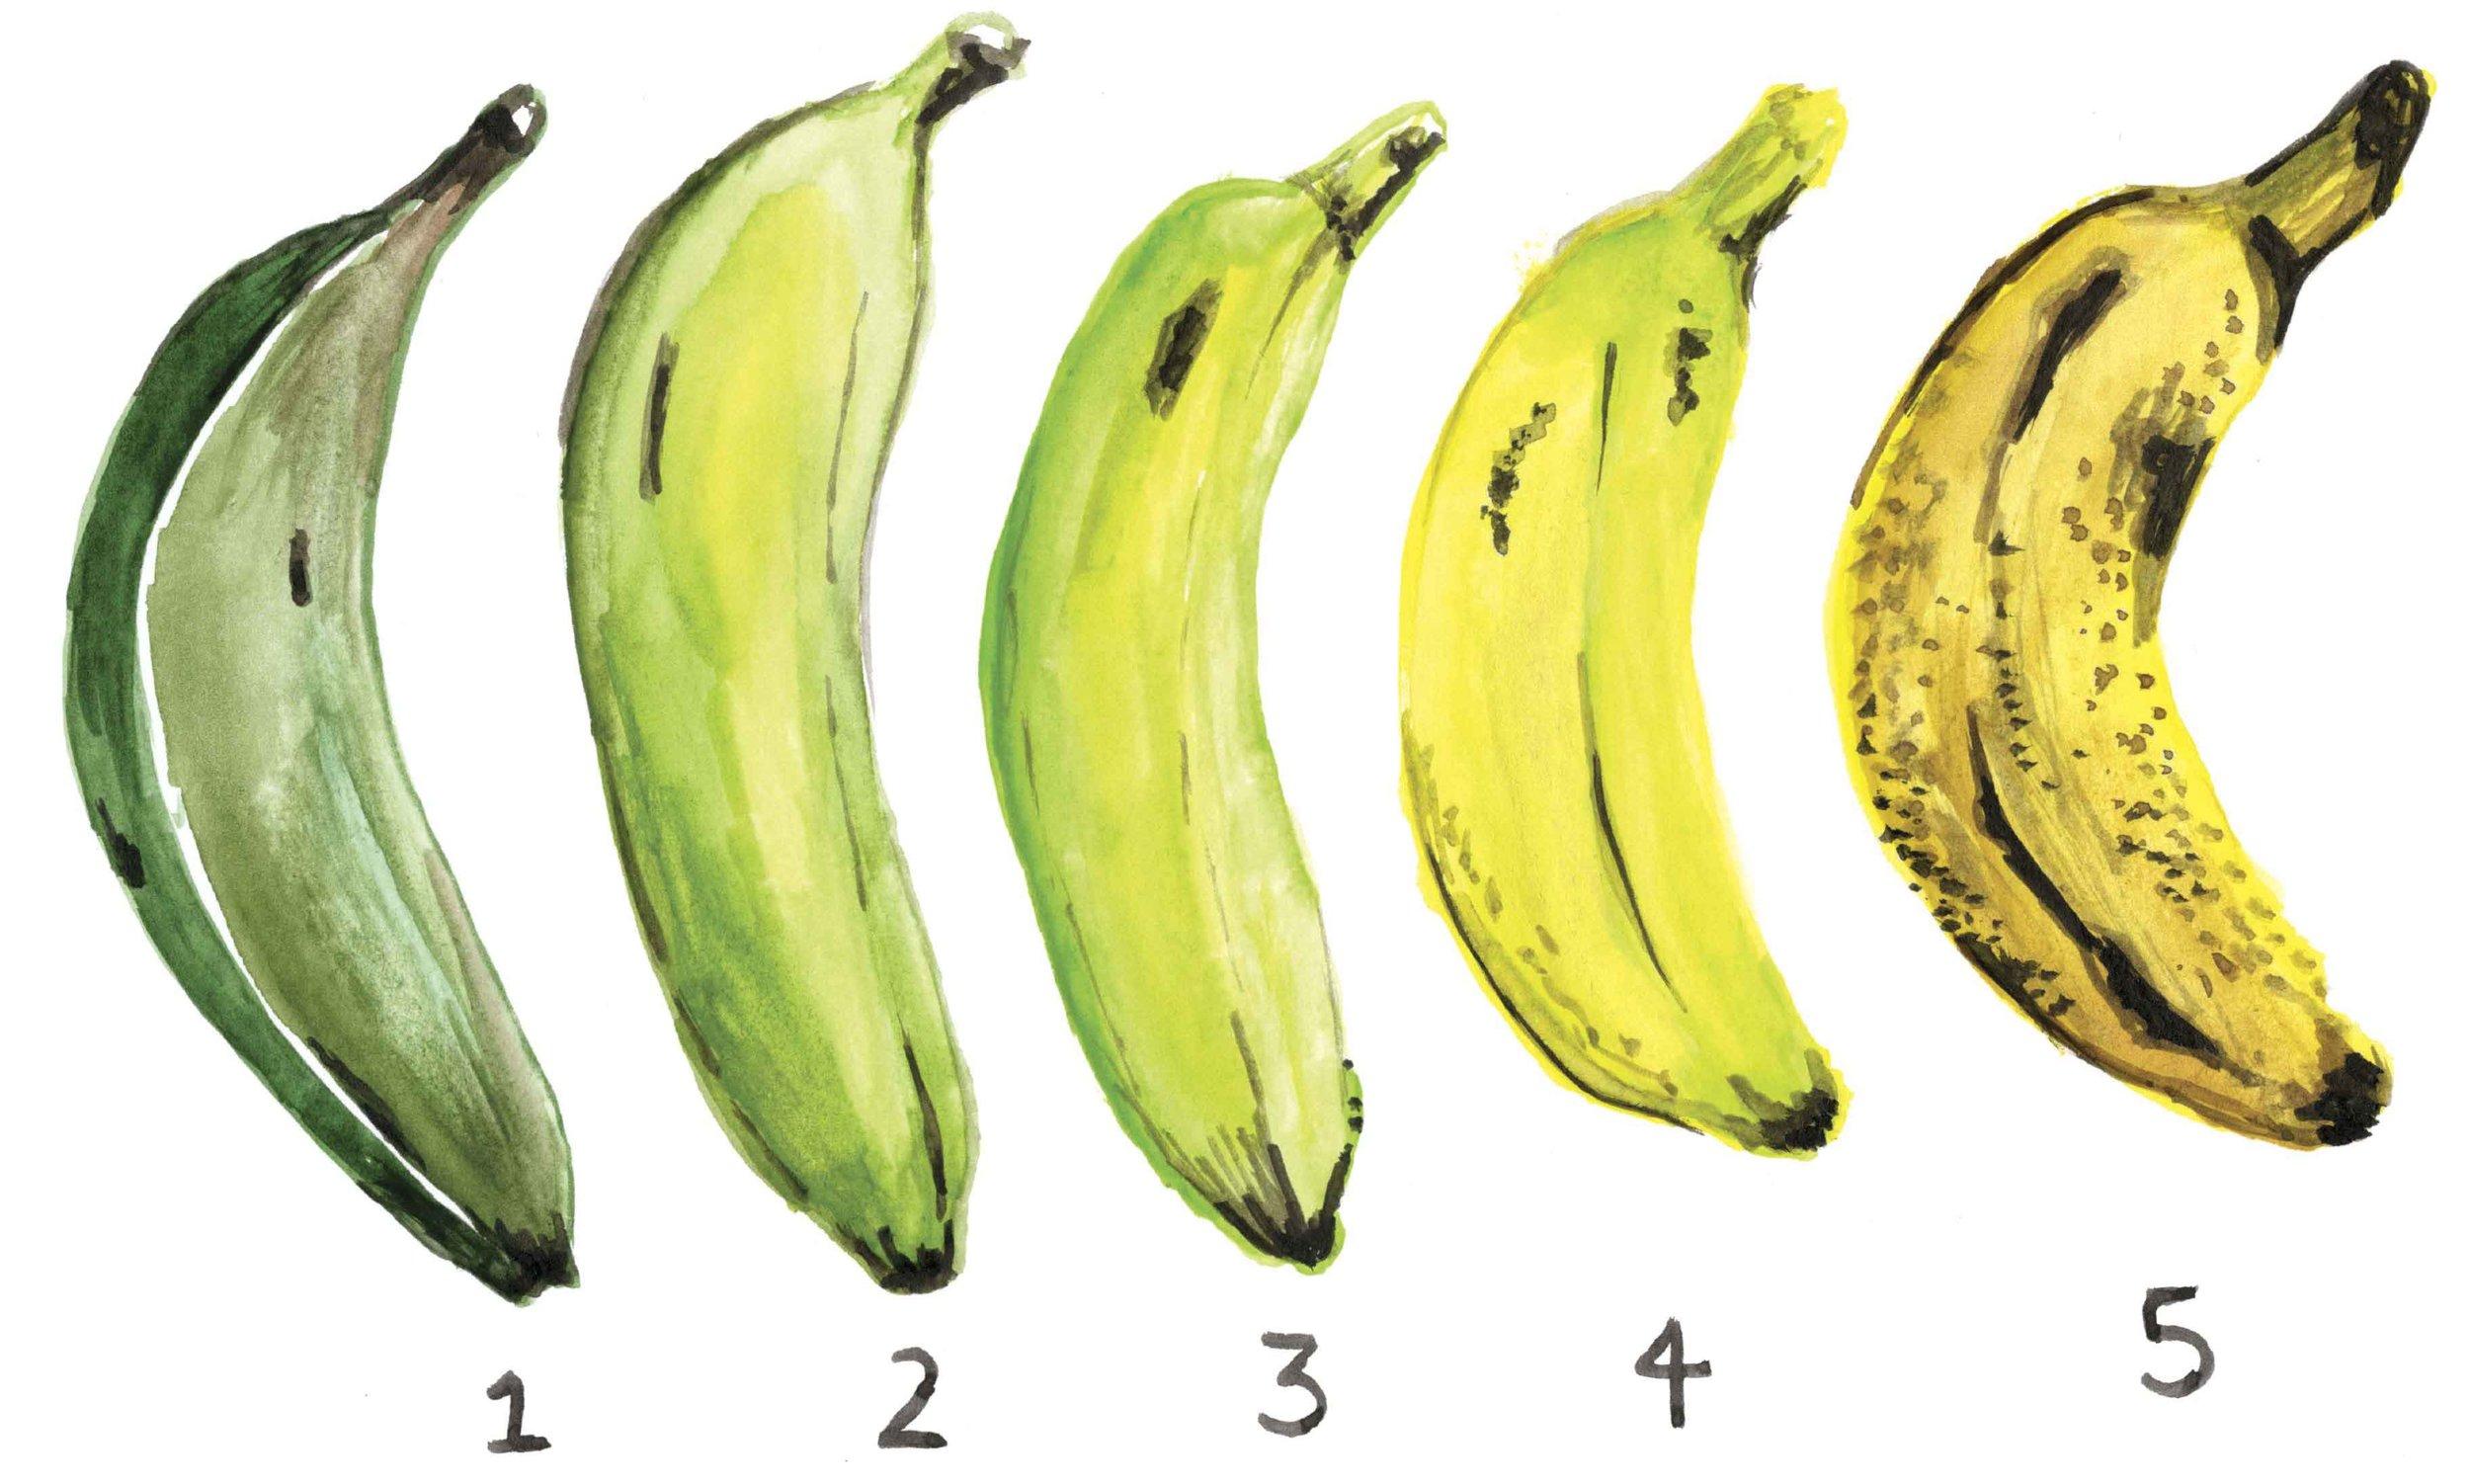 platanos-ilustracion-perdida-comida